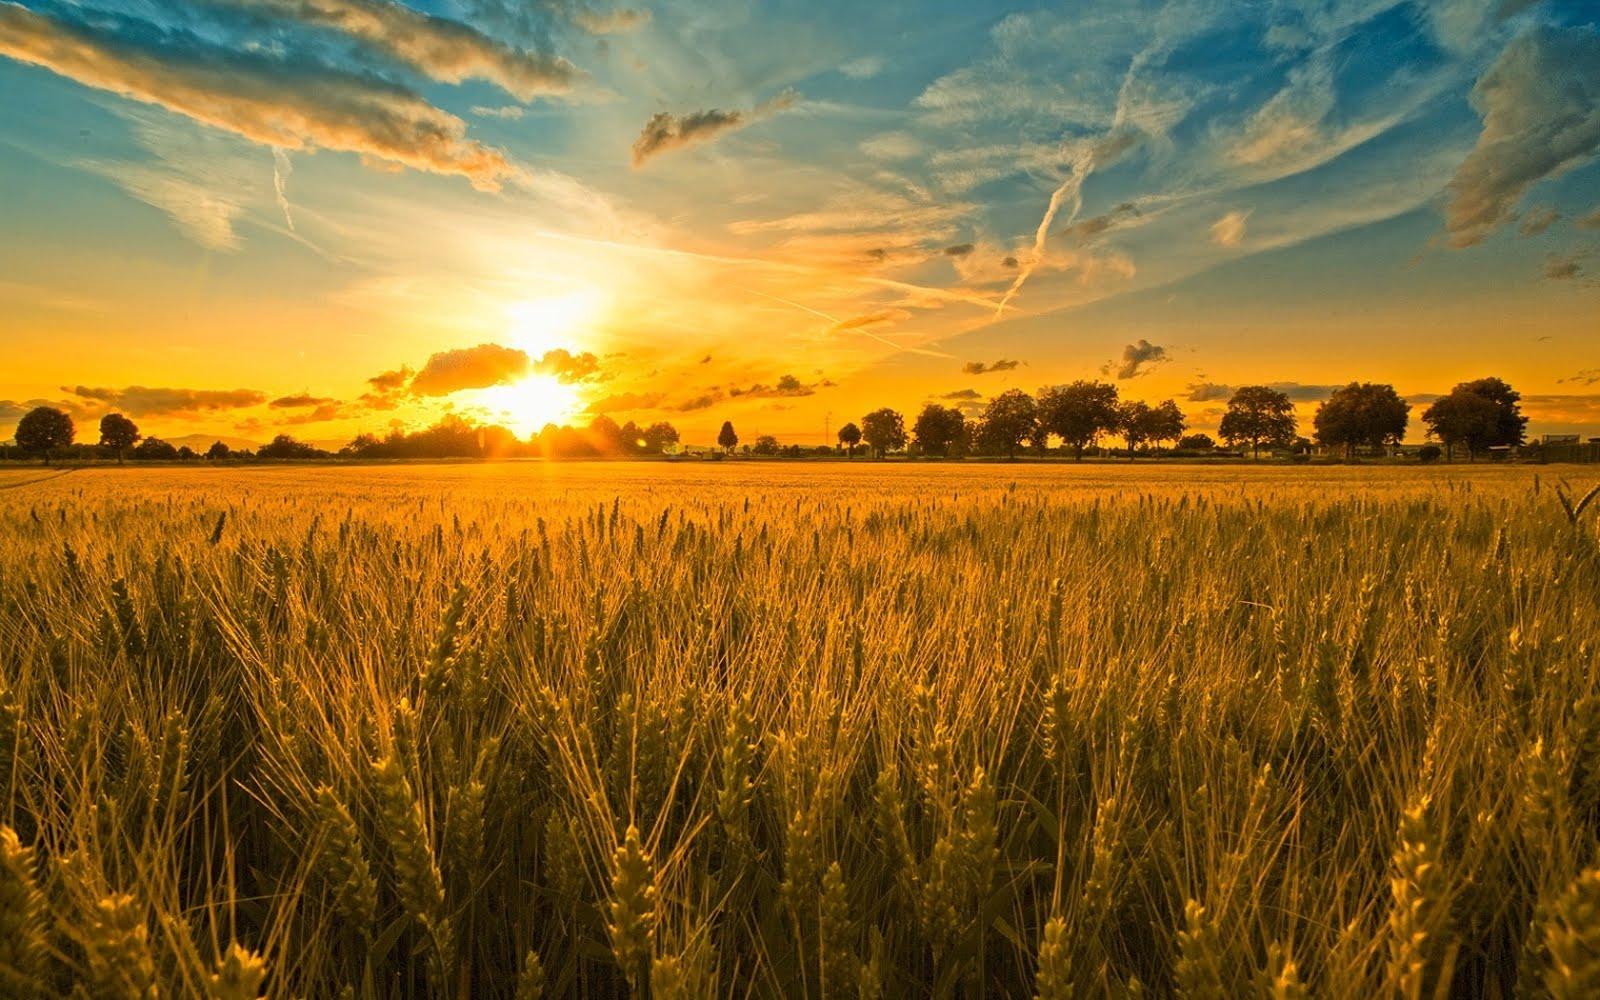 Kate Braun : Lammas is the First Harvest